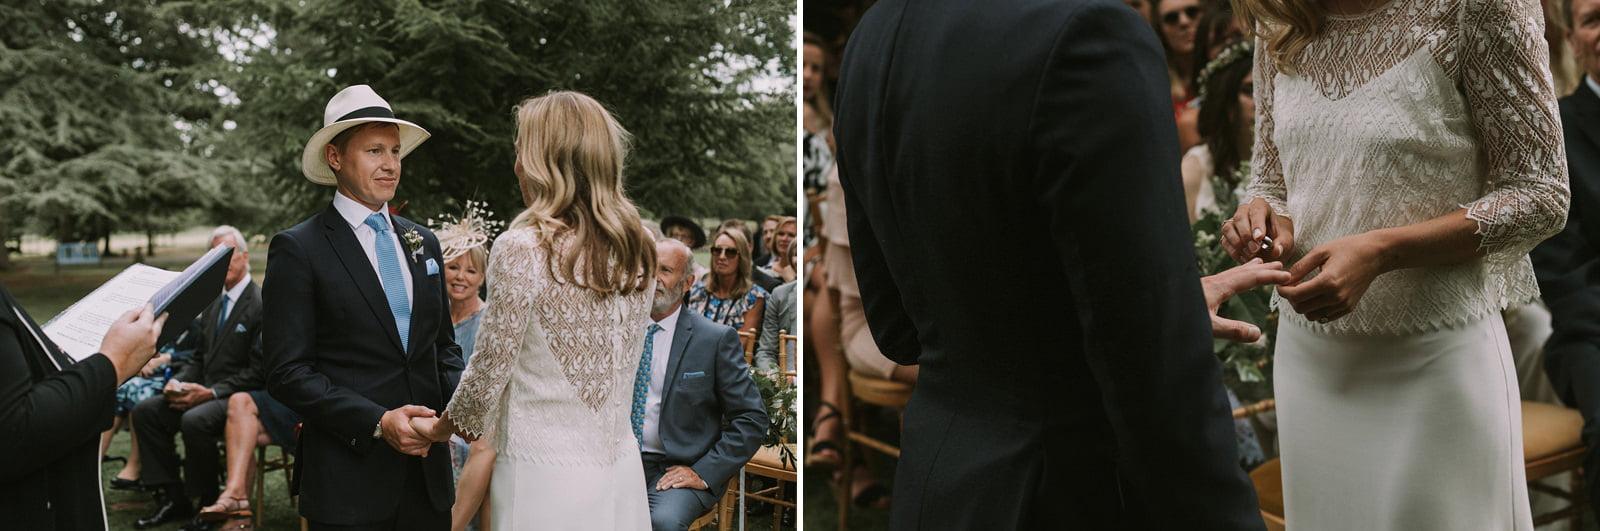 wedding photography storytelling somerset